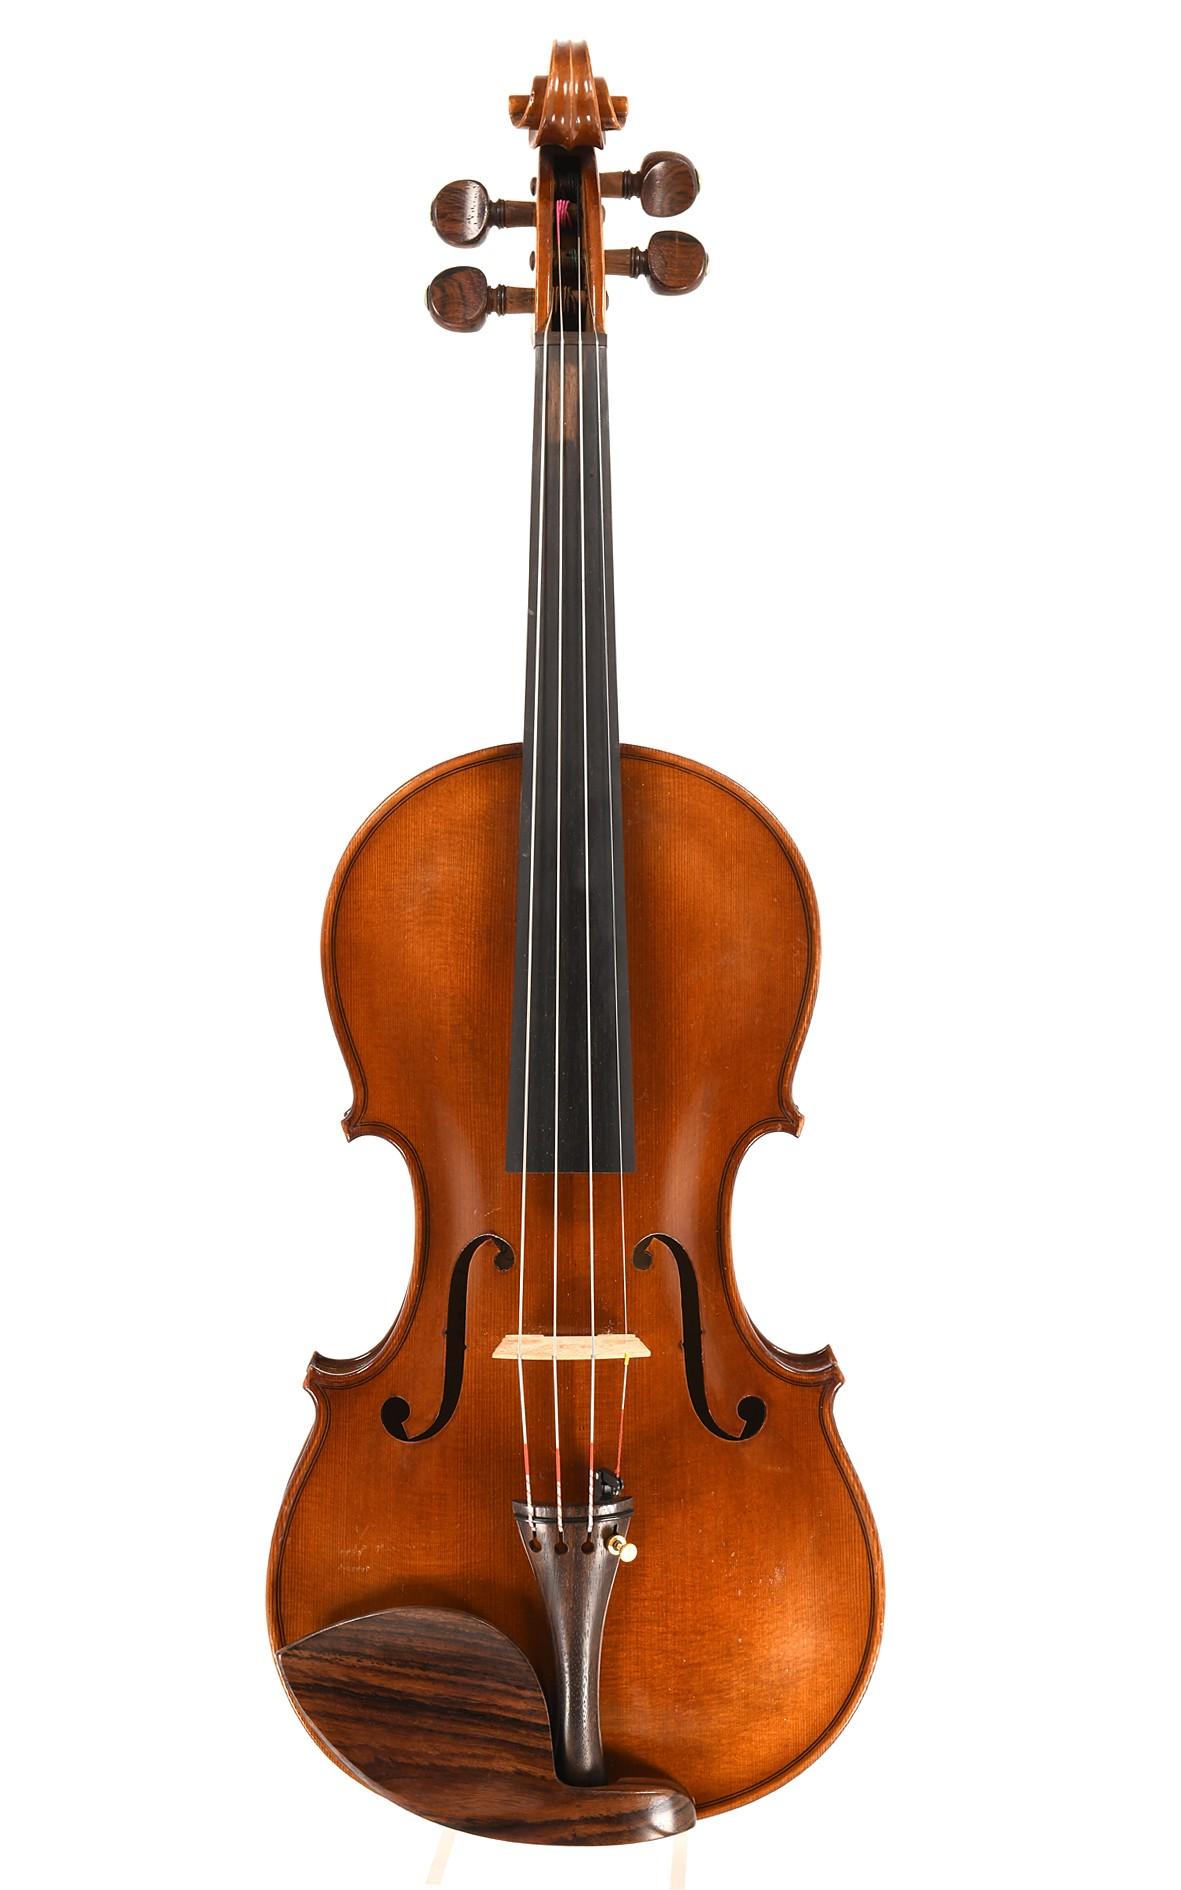 René Morizot, violin spruce top